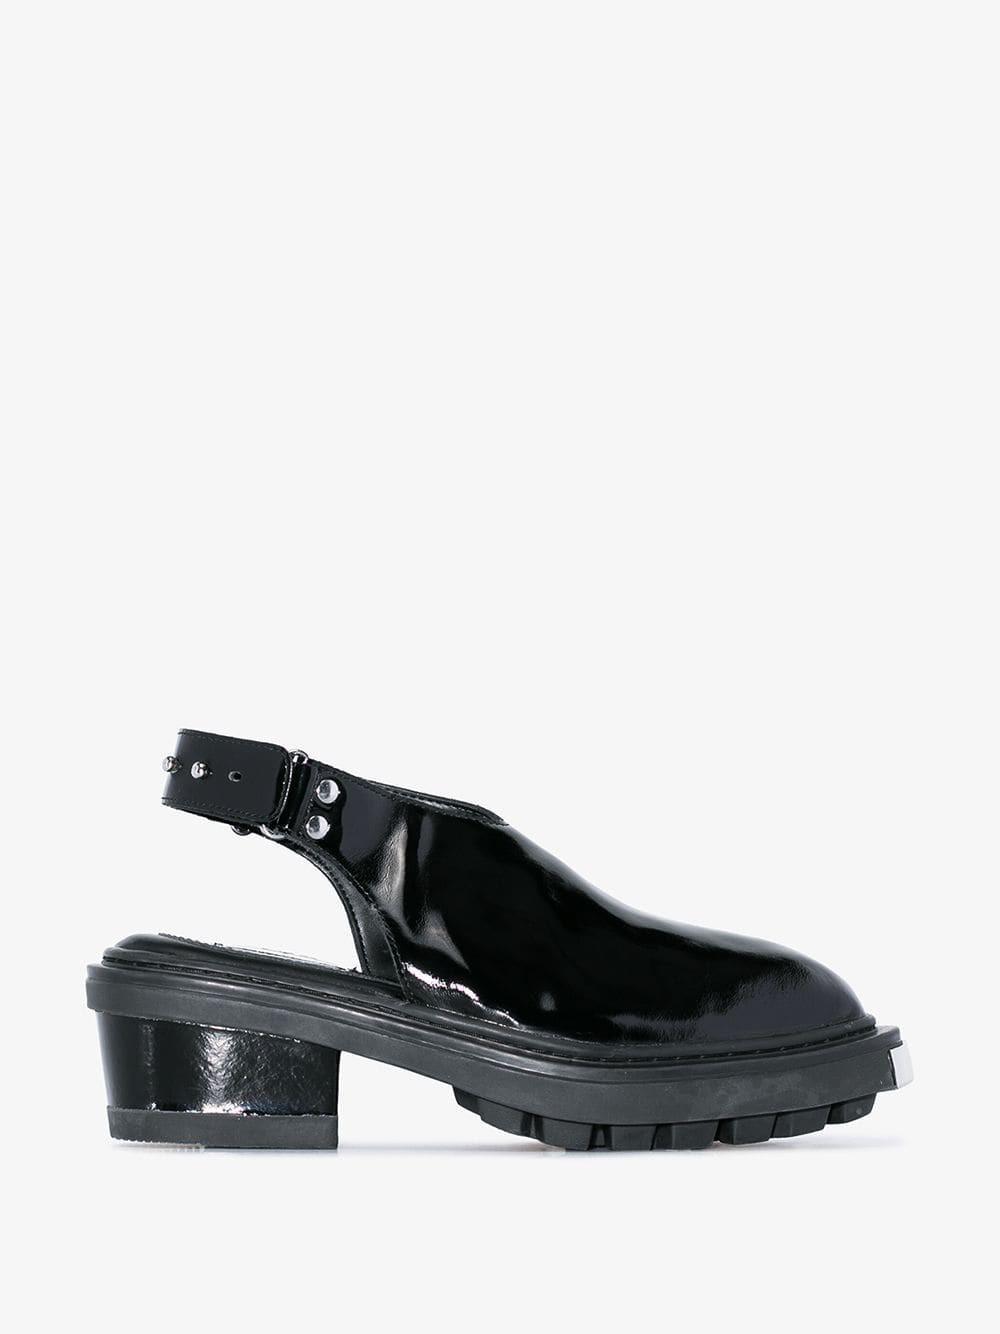 Eytys Carmen patent slingback pumps in black